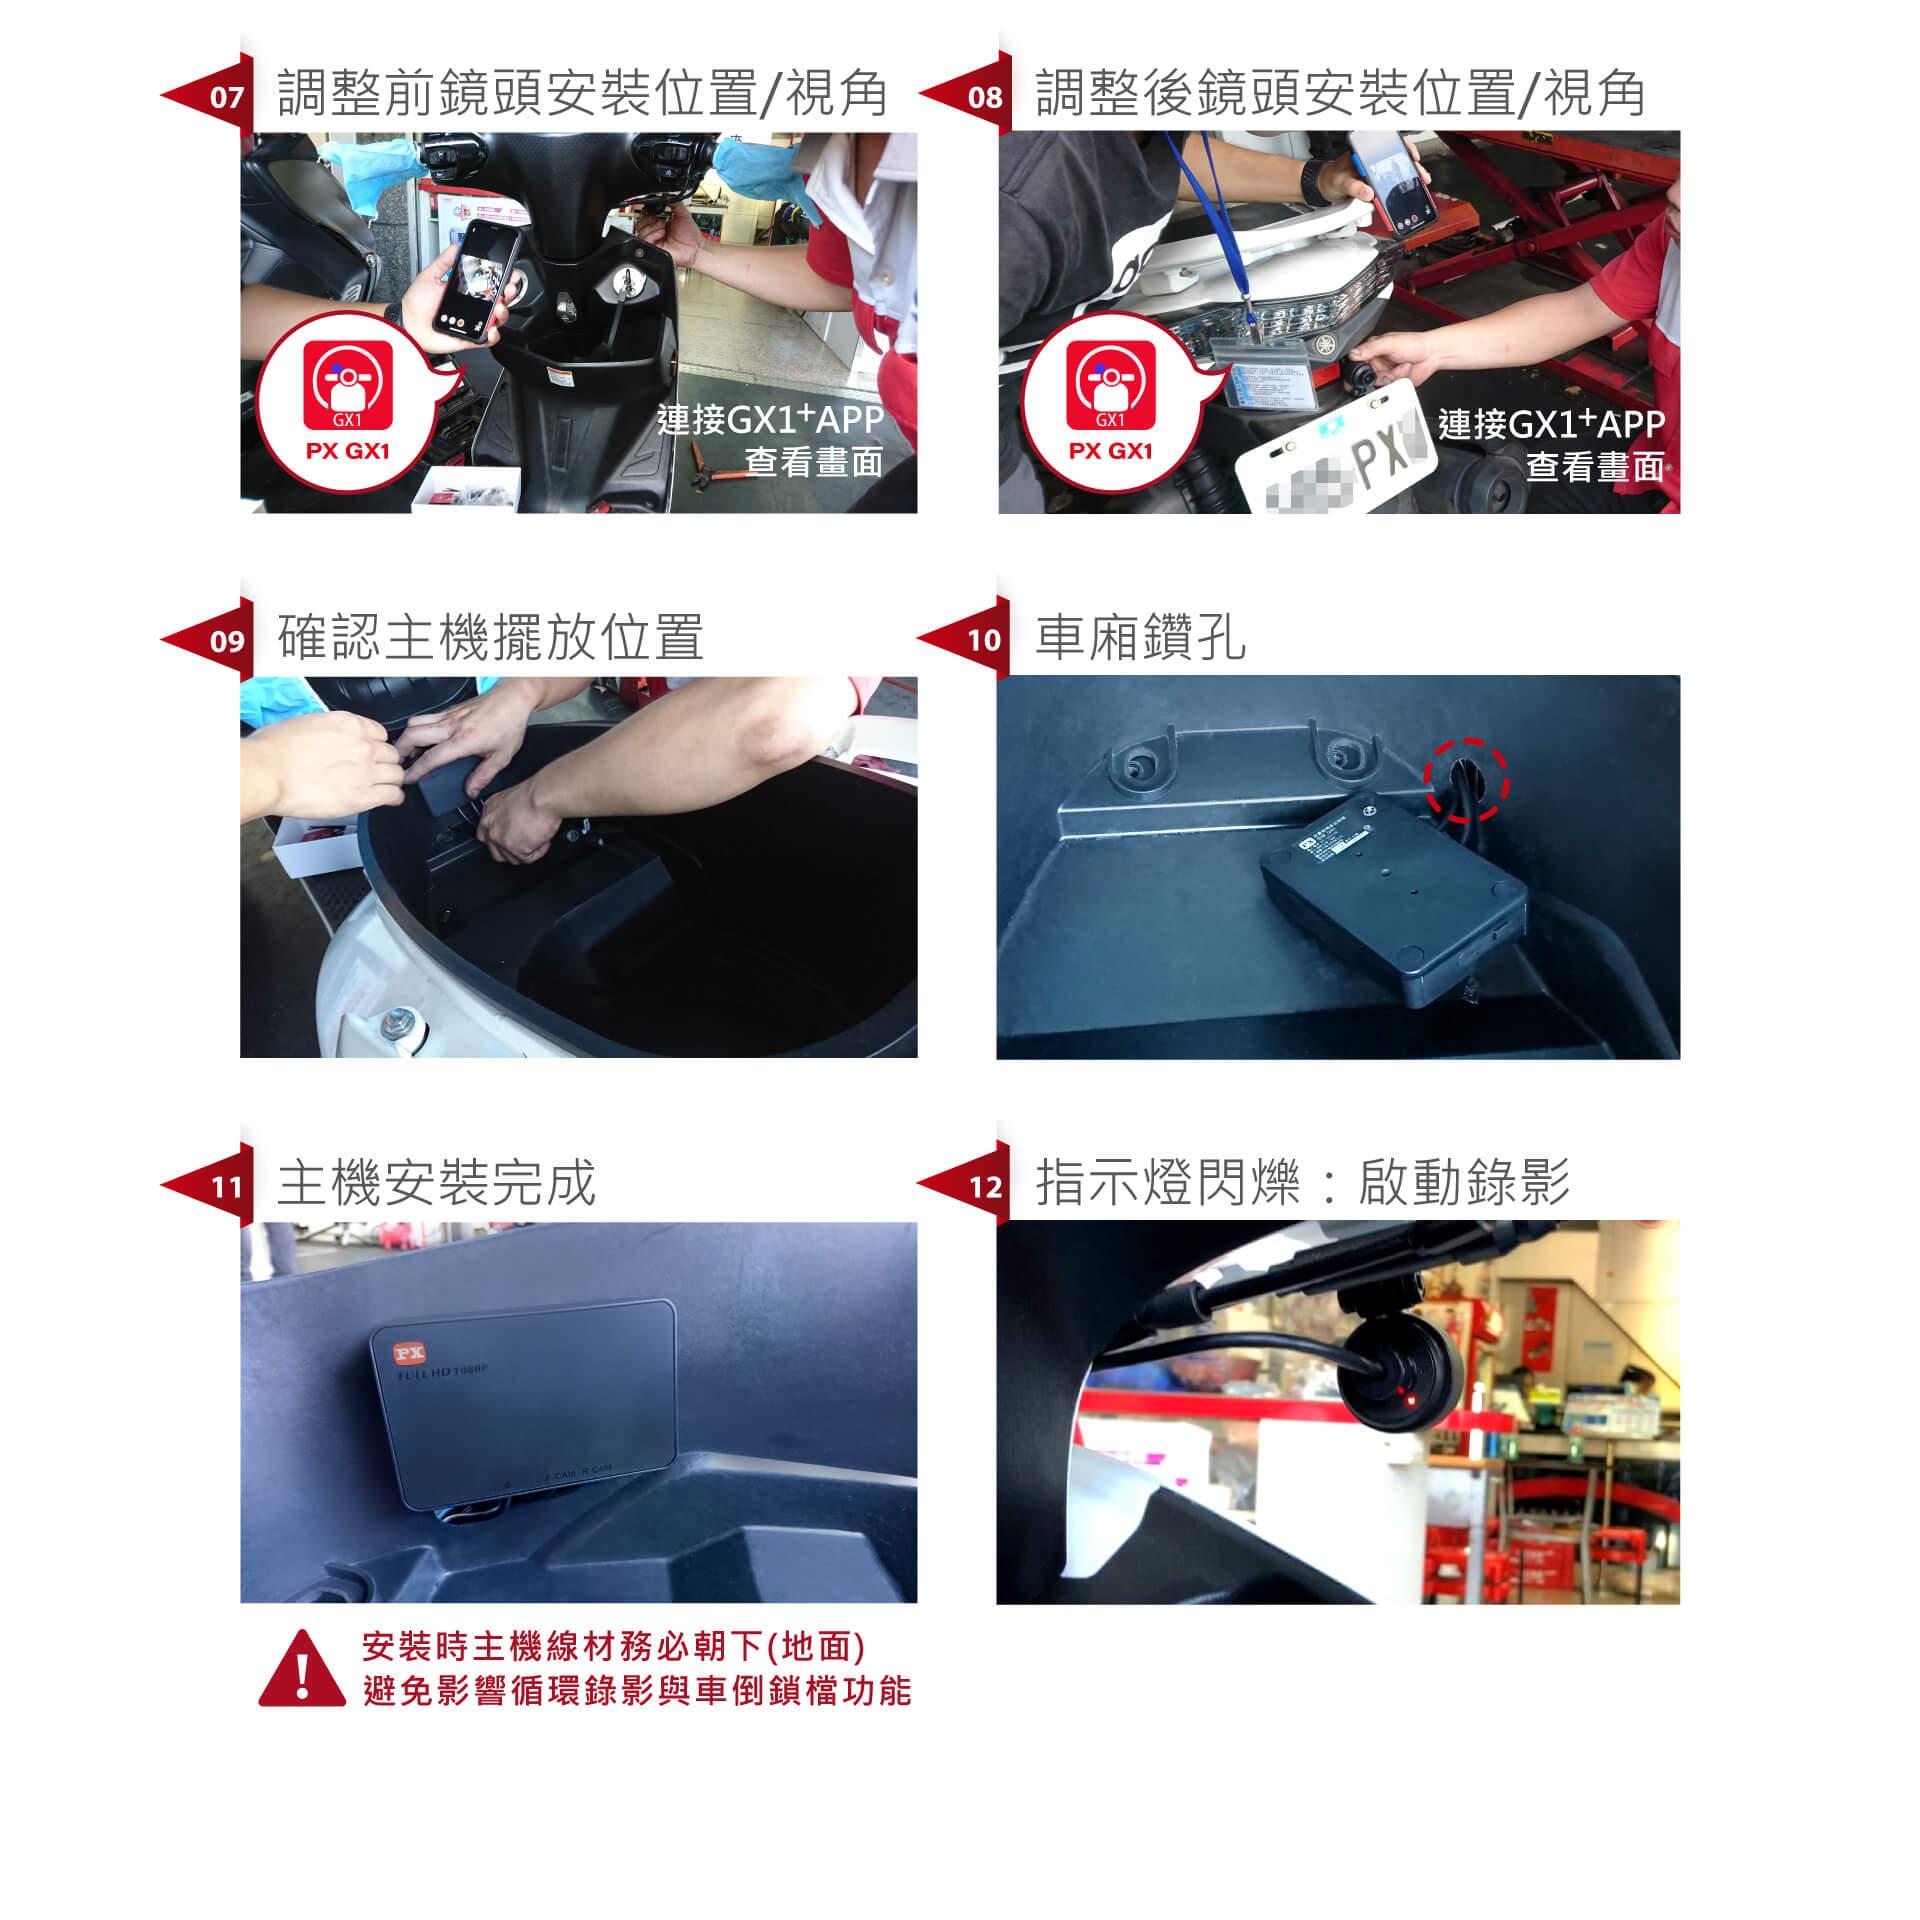 proimages/product/Bike_Cam/PX-GX1_Plus/PX-GX1-安裝步驟-02-1012.jpg